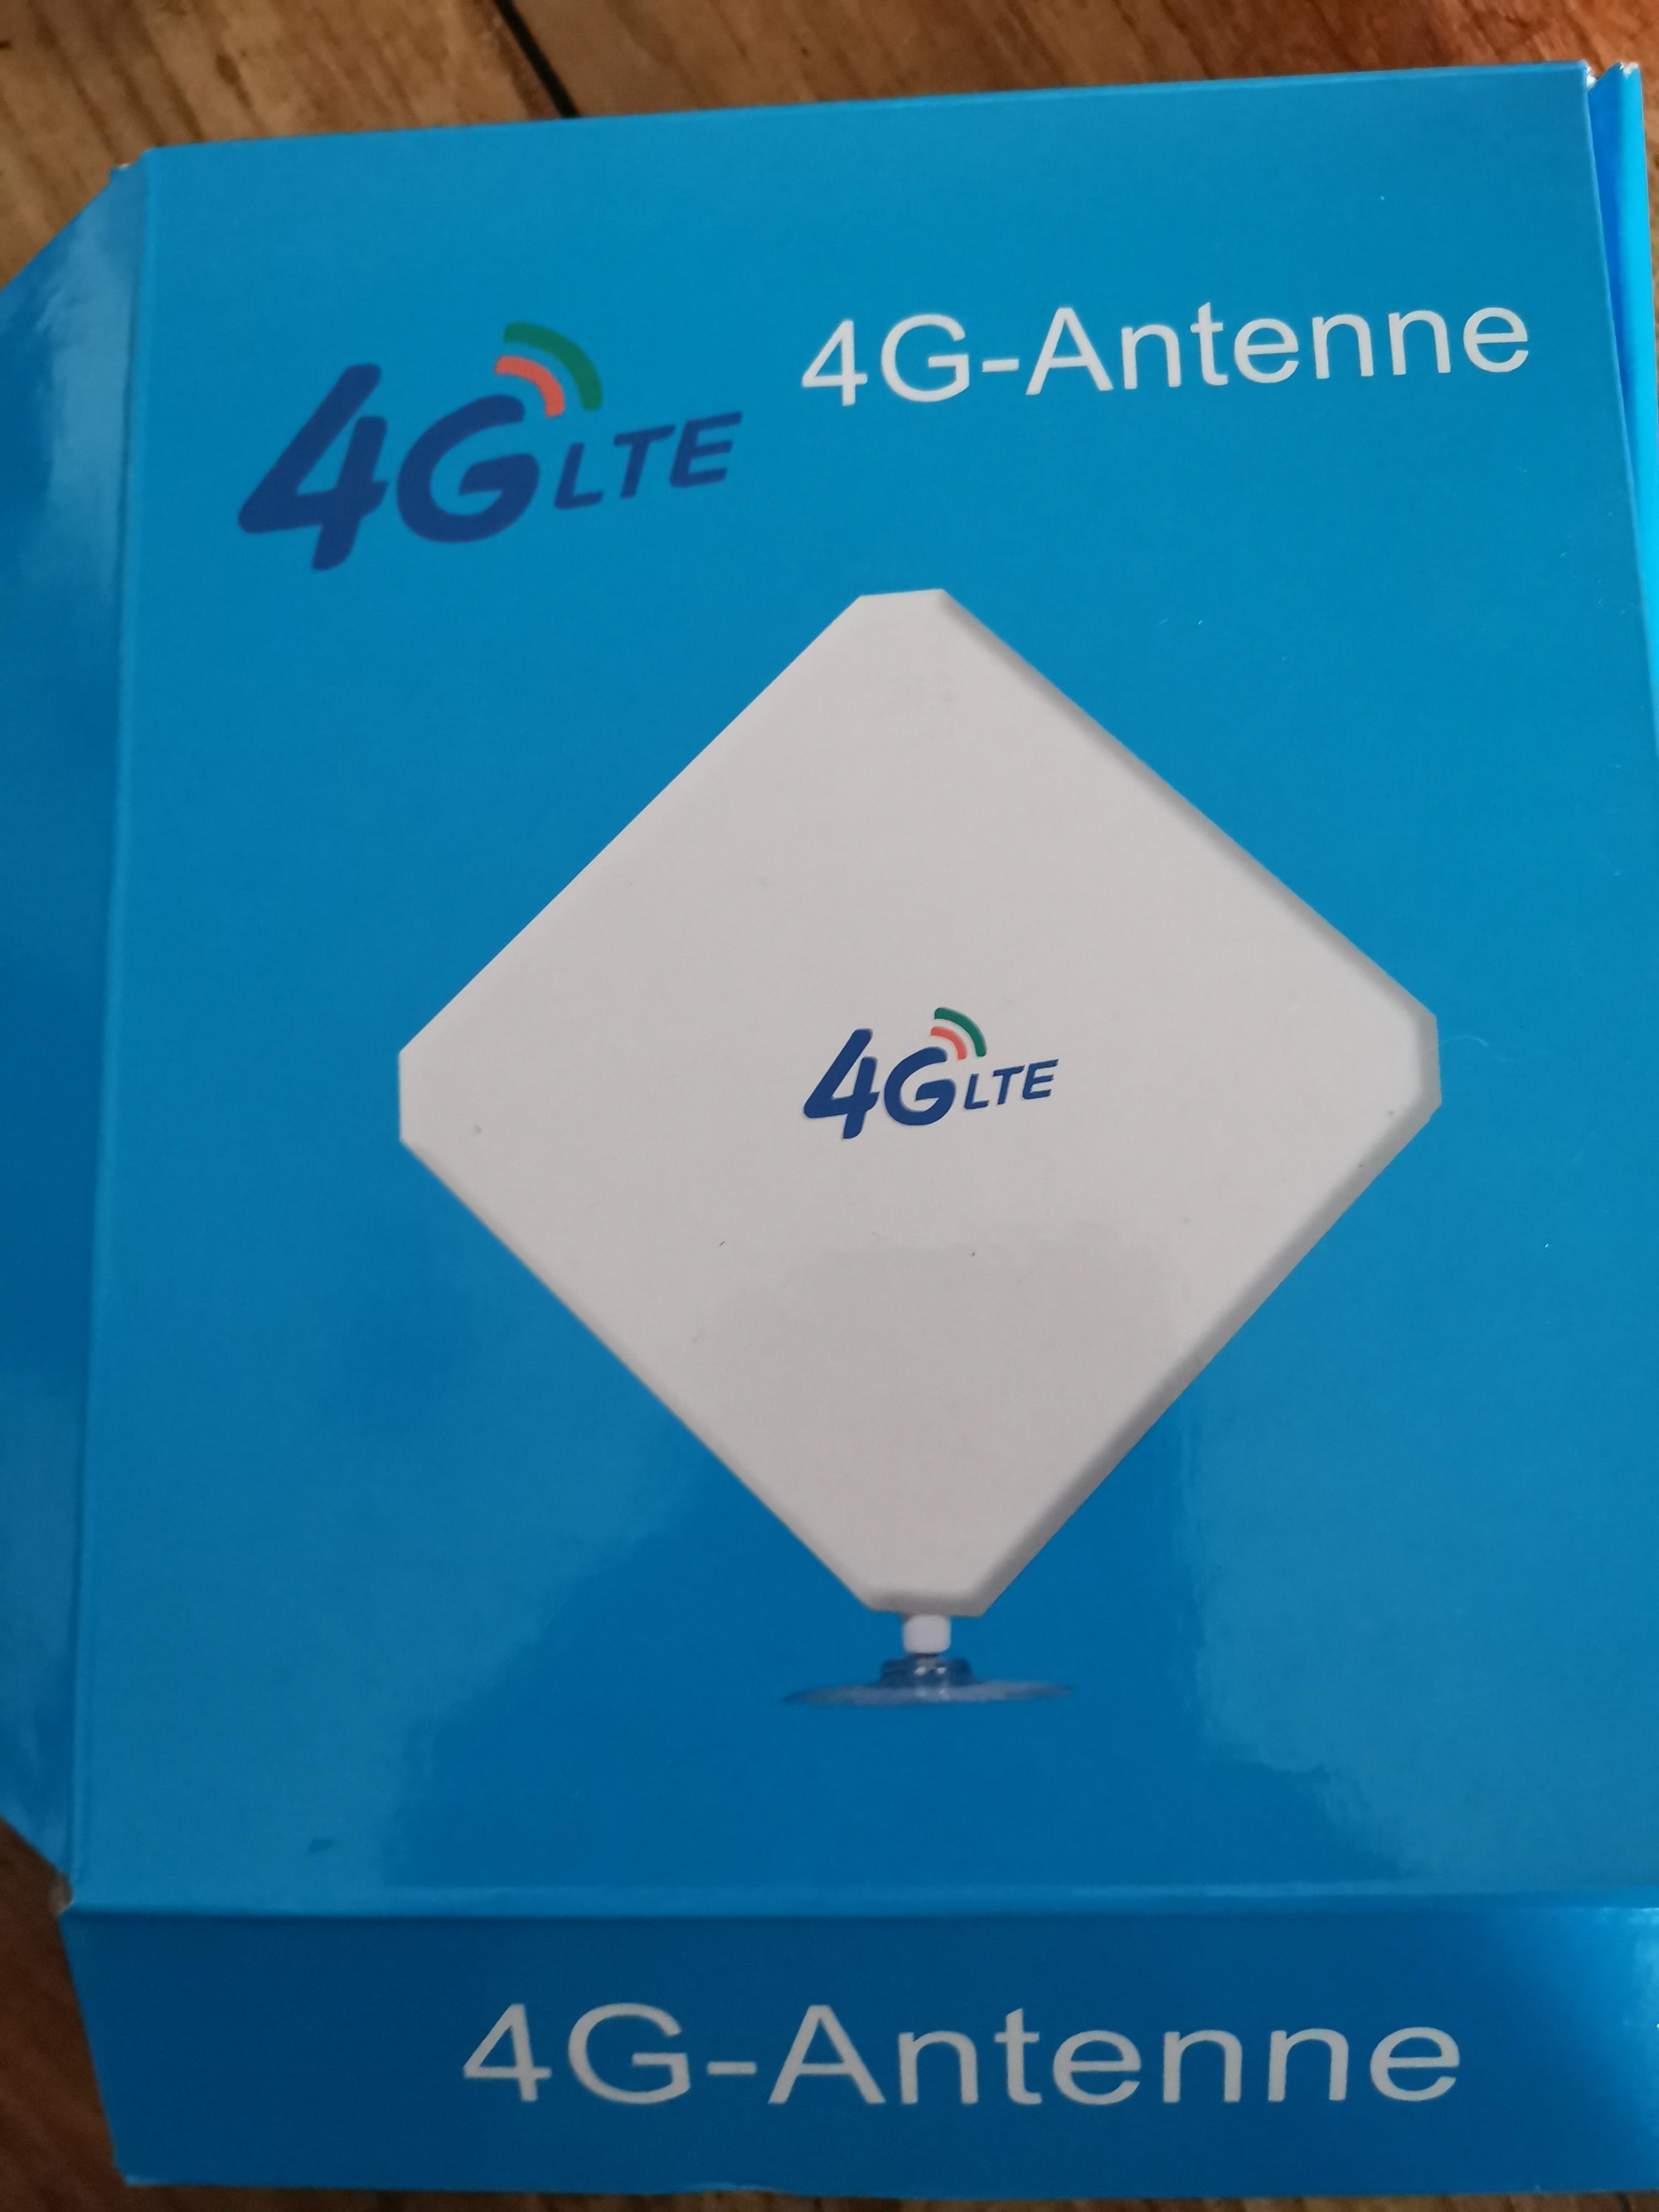 troc de troc antenne 4g image 1